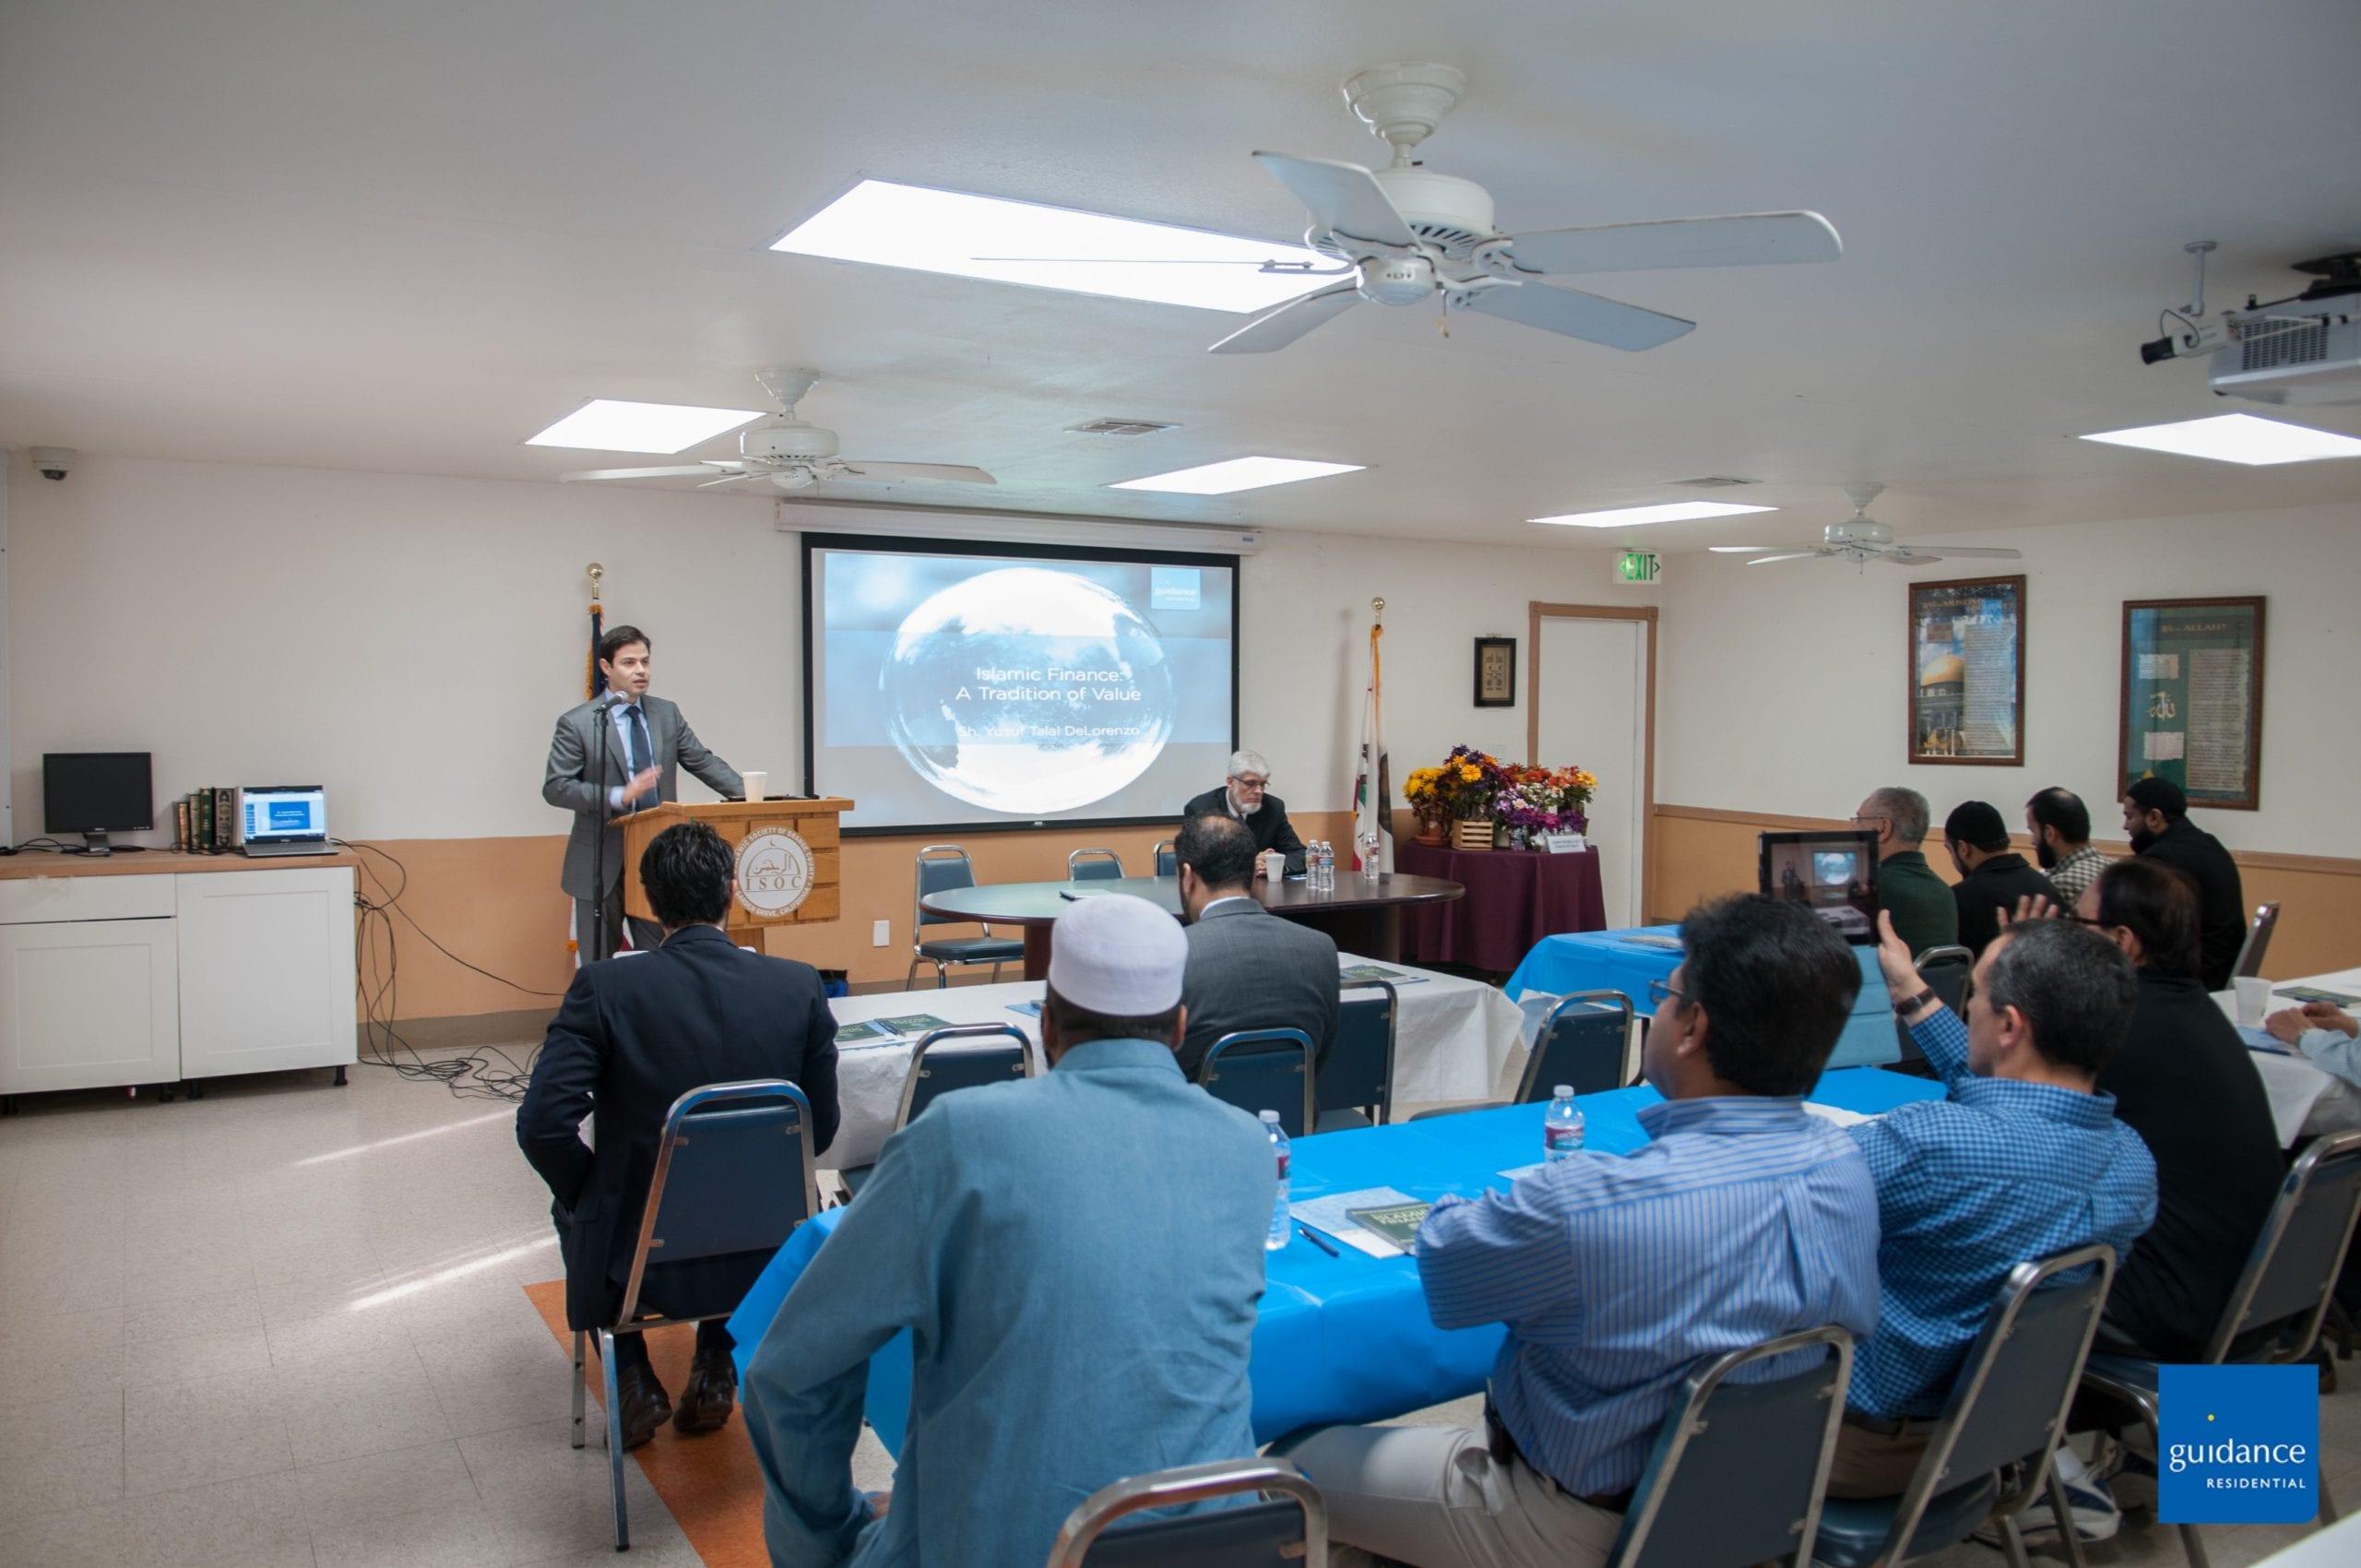 Shaykh Yusuf DeLorenzo - California - Guidance Residential 11